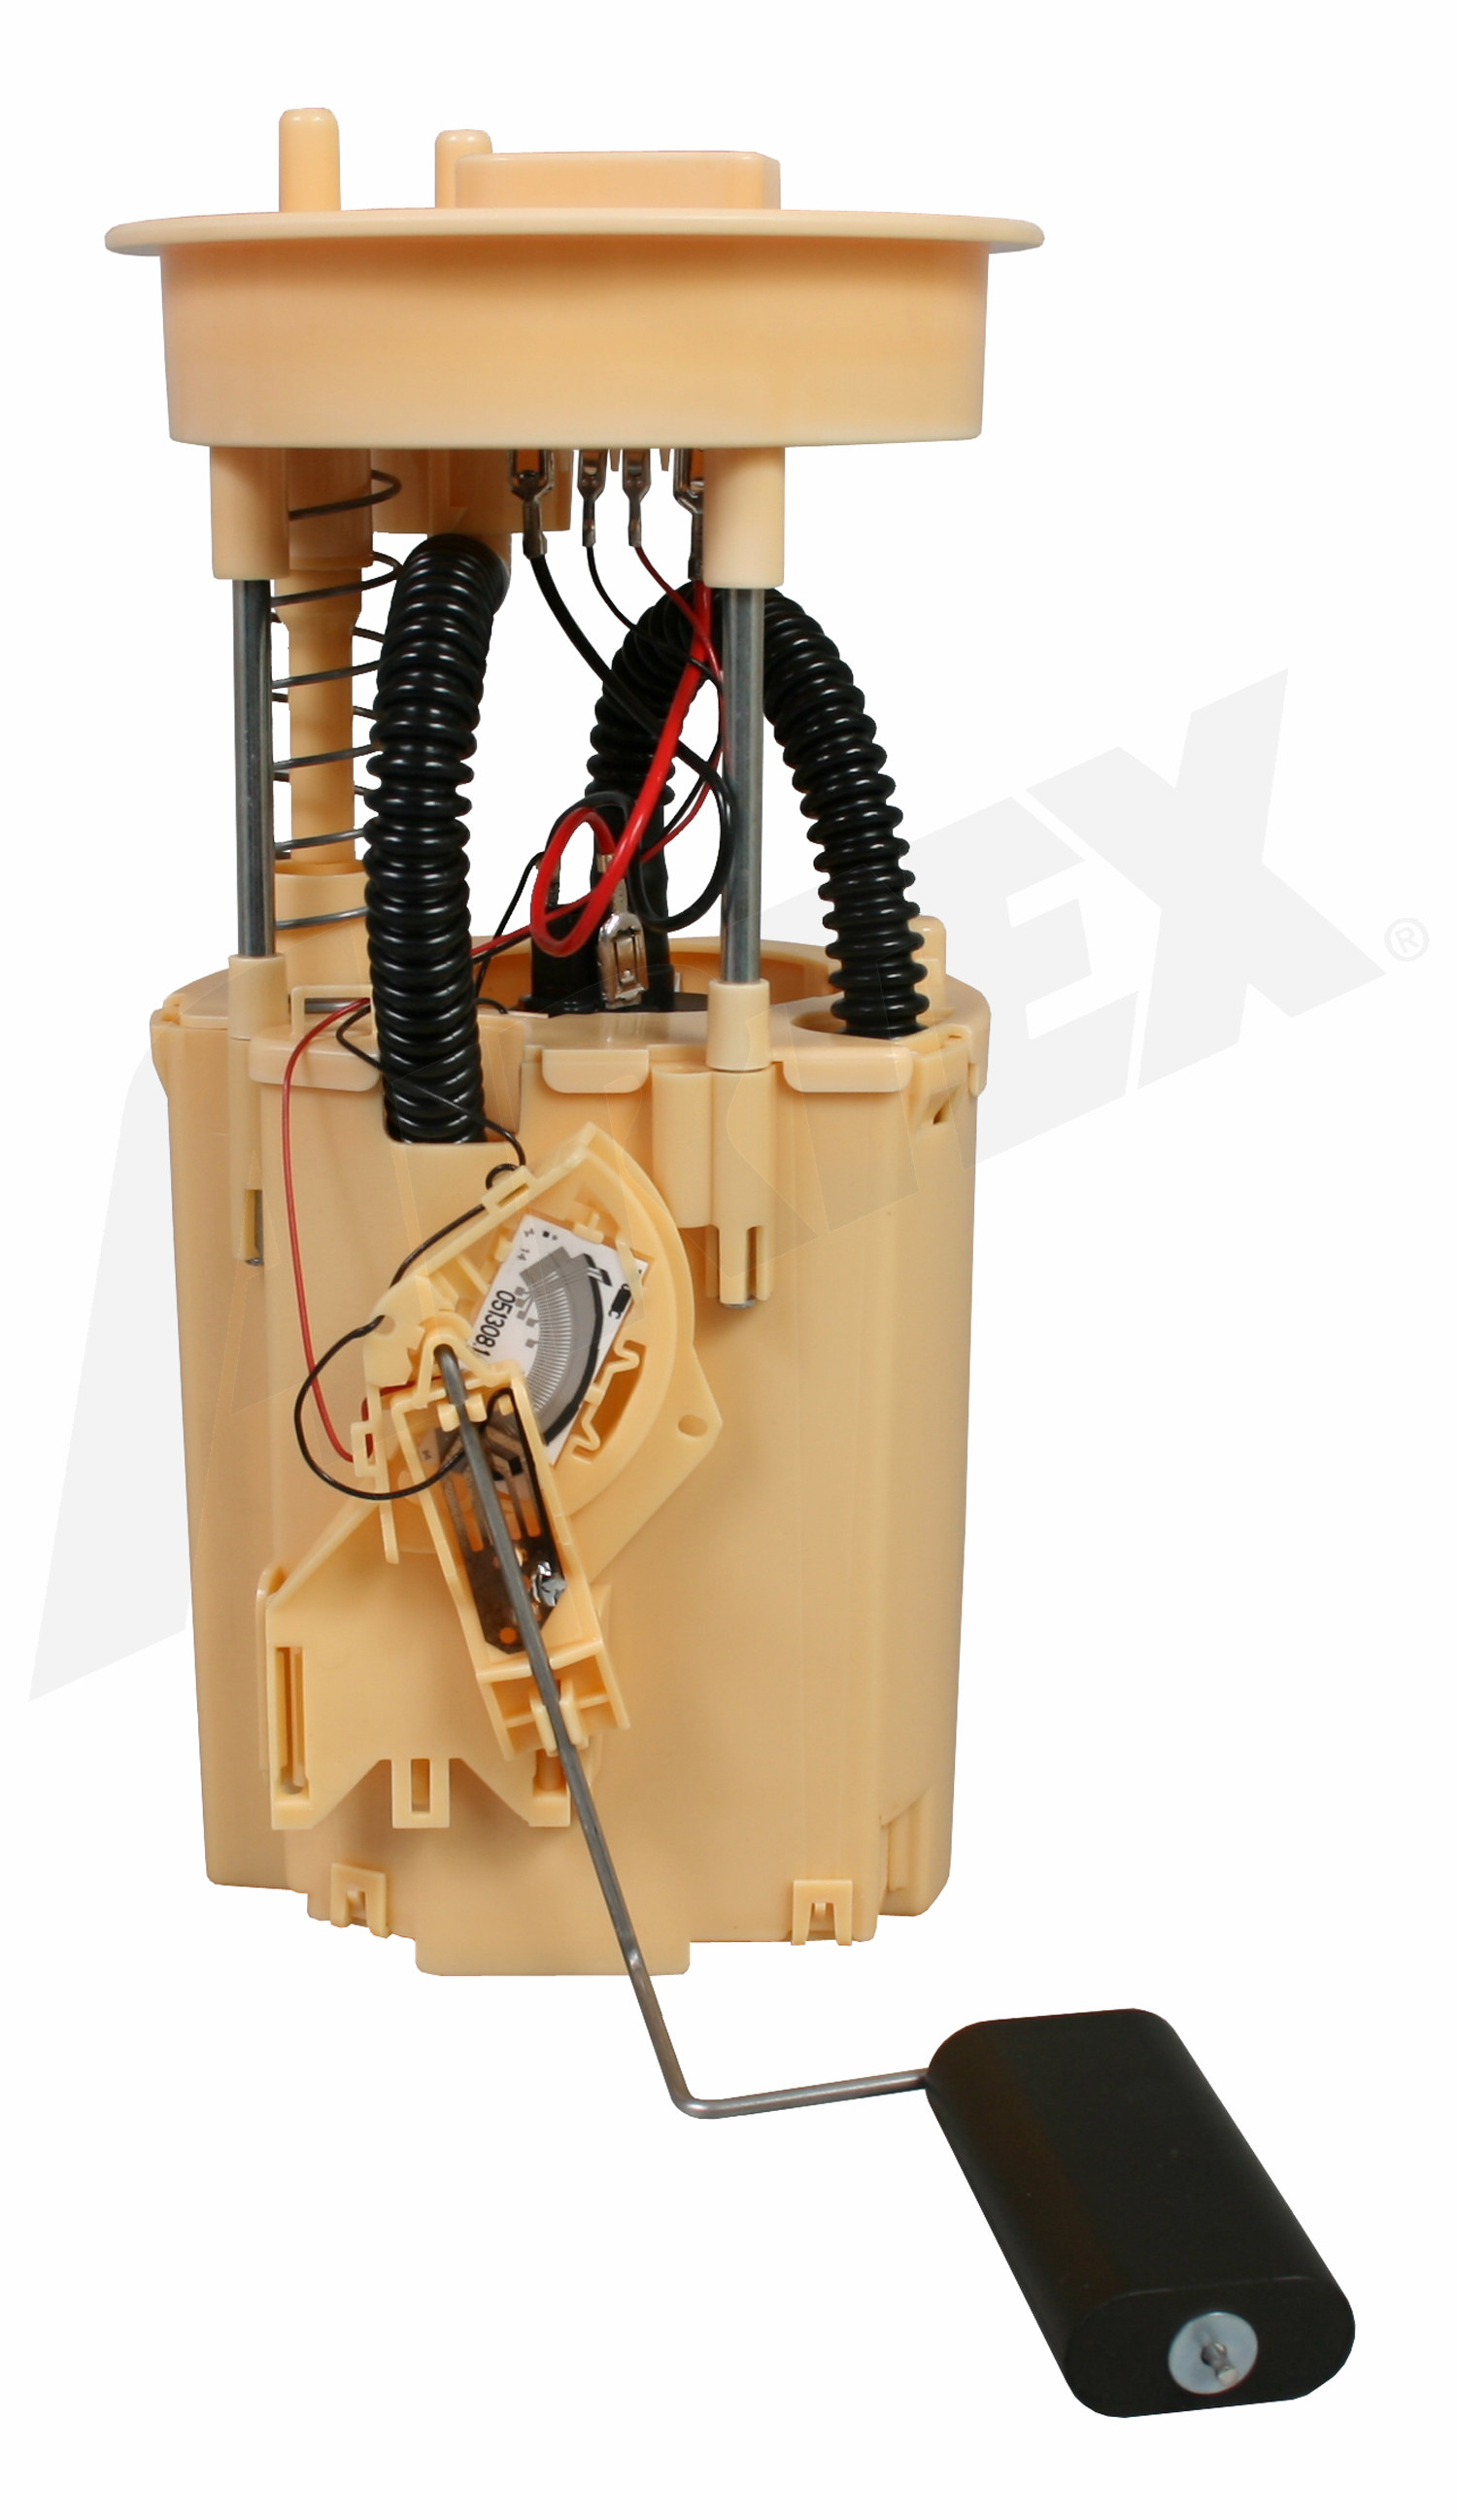 Airtex Fuel Pumps E8668M Fuel Pump Module Assembly Fits 2004-2005 Volkswagen Jetta